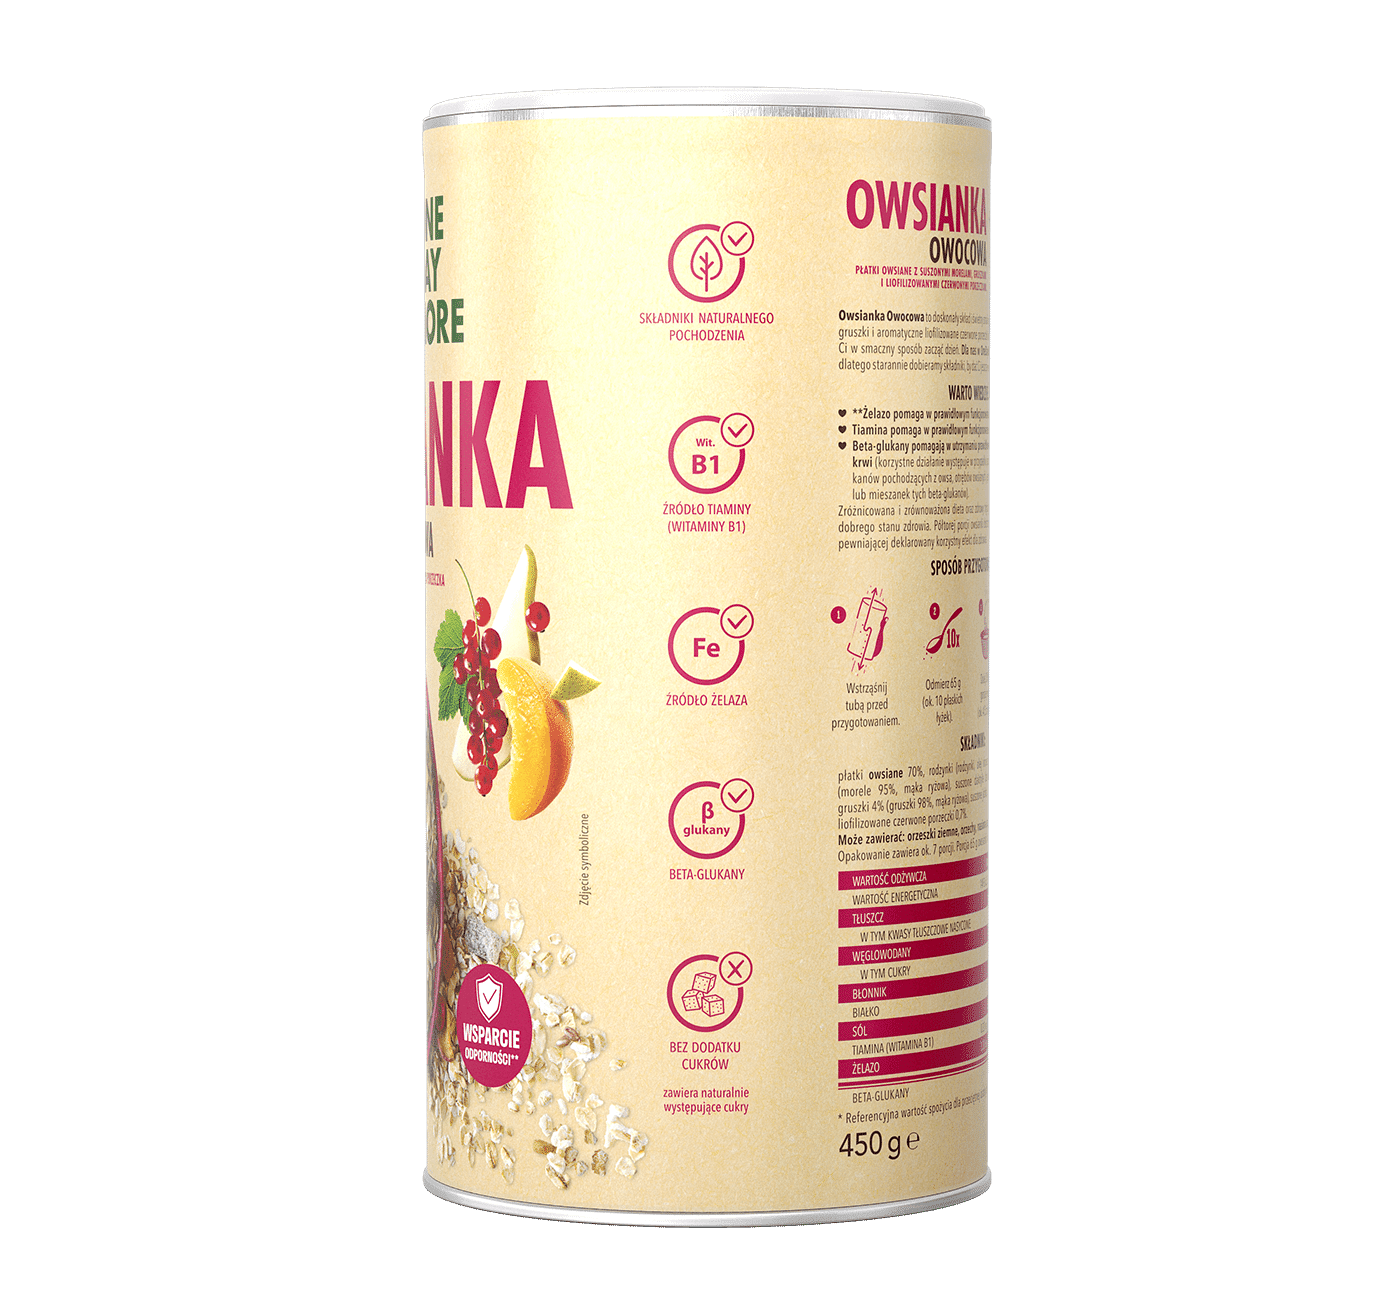 owsianka-owocowa-onedaymore-tuba-1400x1291_2